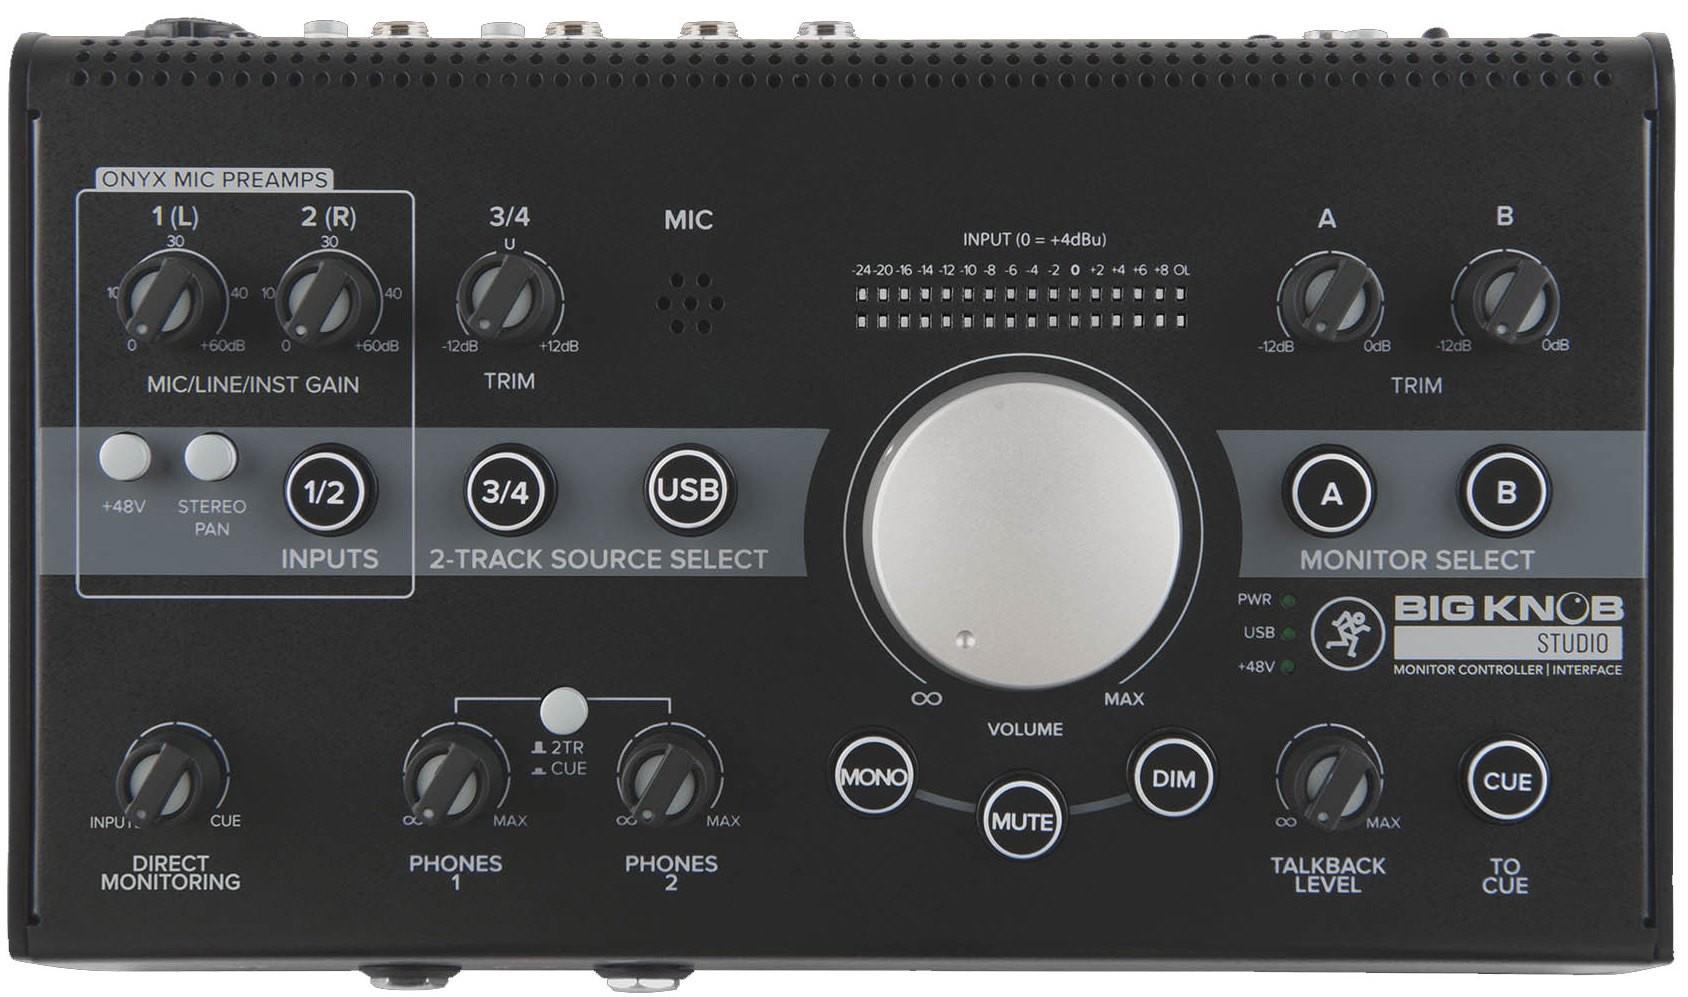 Контроллер Mackie Big Knob Studio